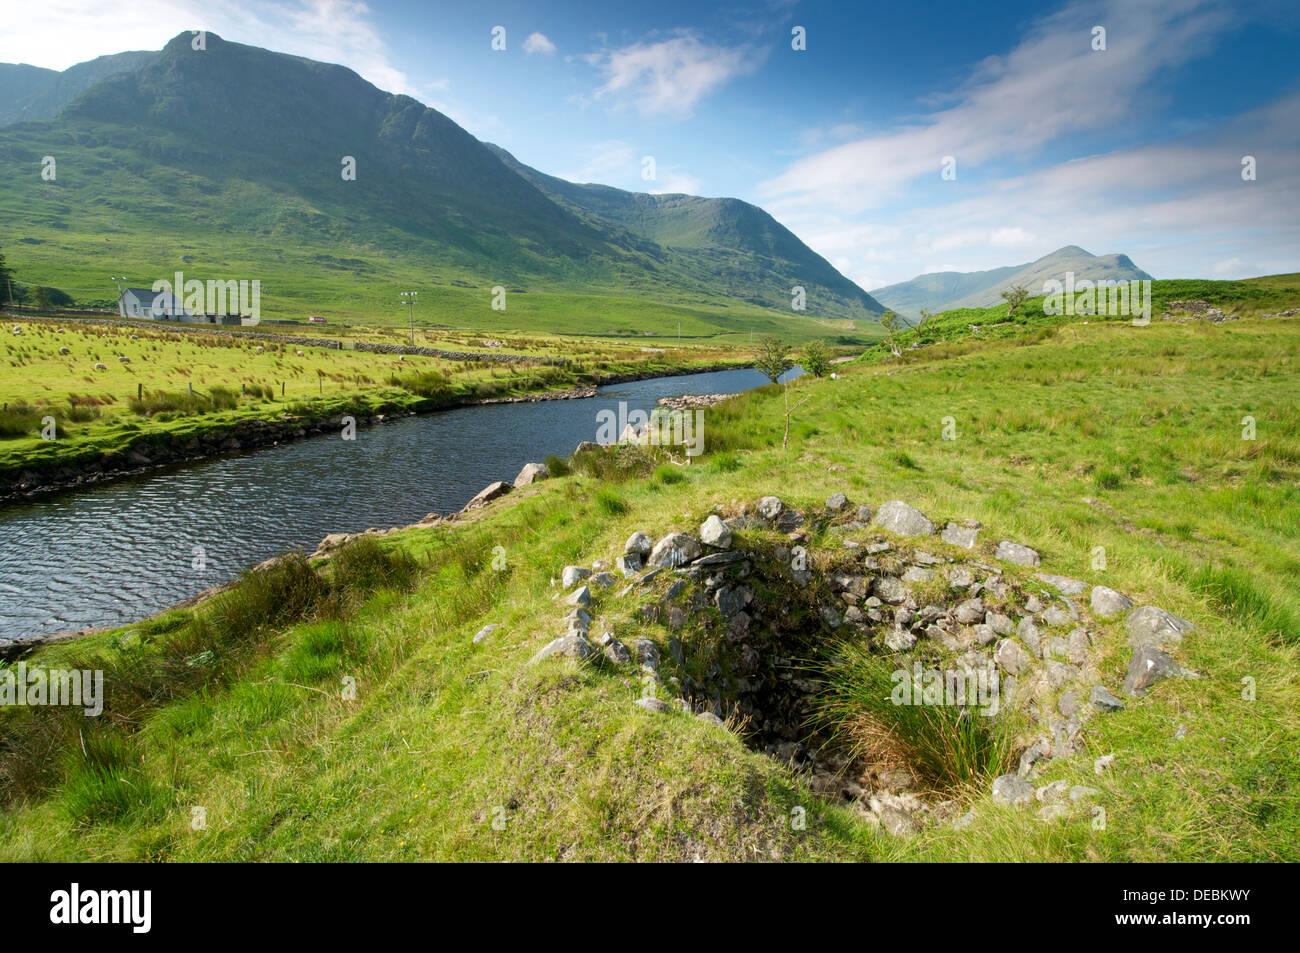 River Erriff valley western Ireland - Stock Image